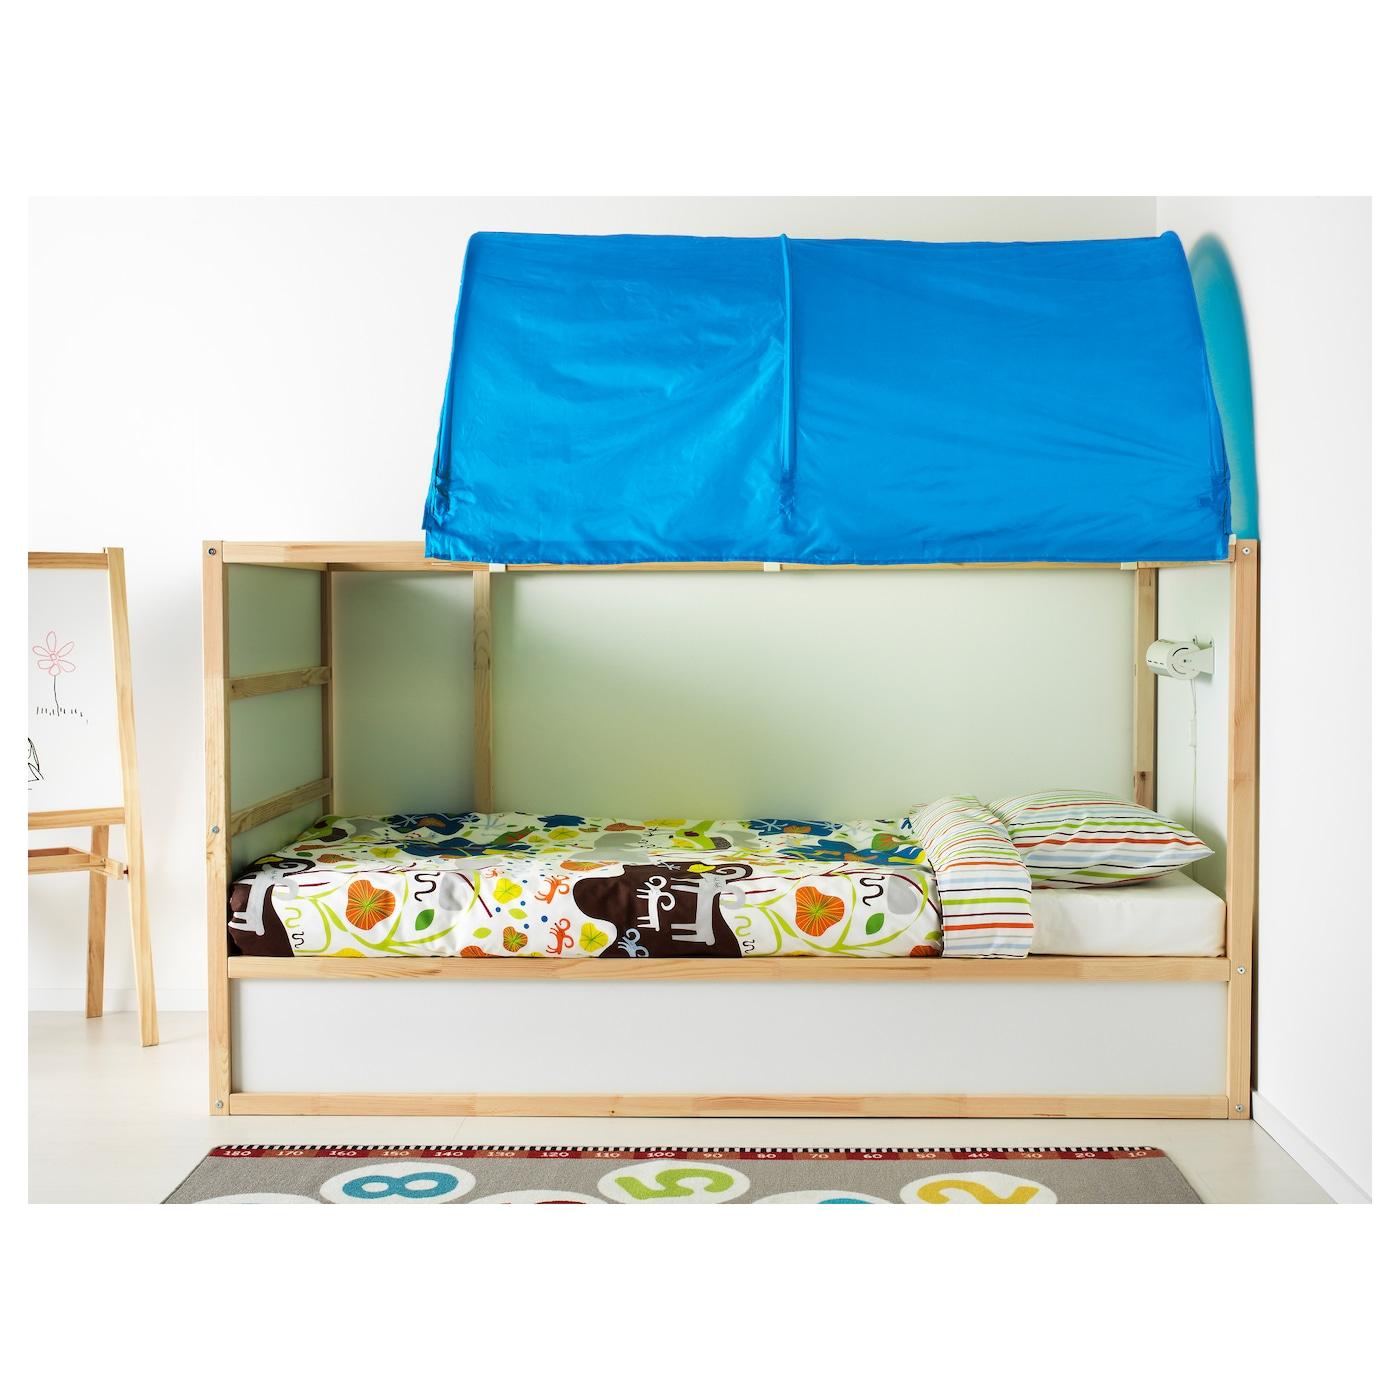 Ikea Kura Bed Tent 1 Blue Toys Games Kids Bedding Pacificcross Com Vn